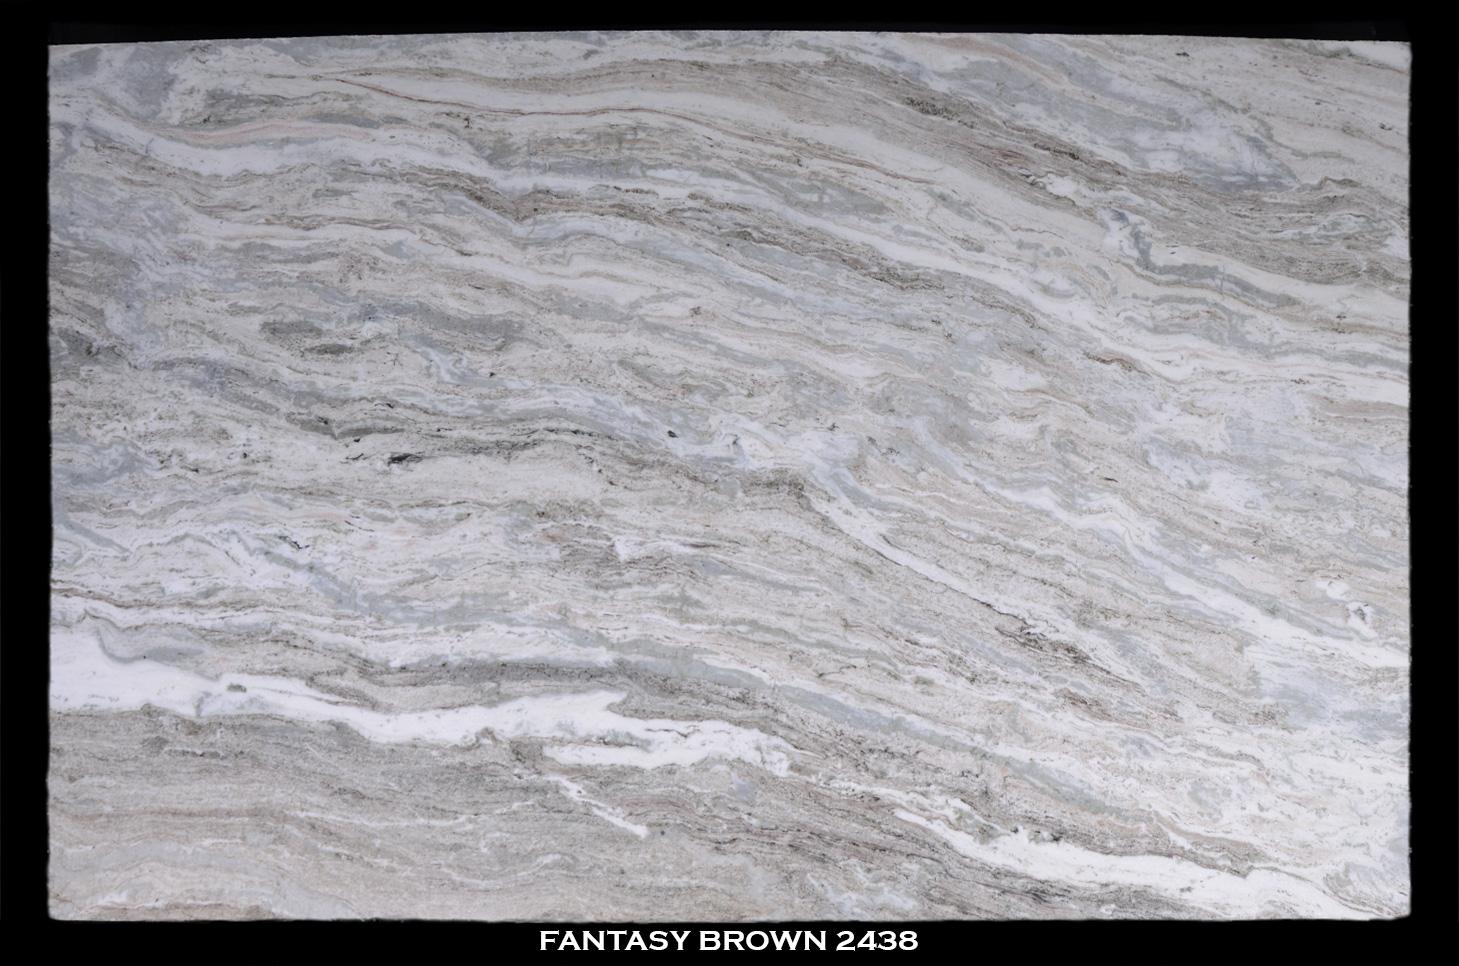 fantasy-brown-2438-slab